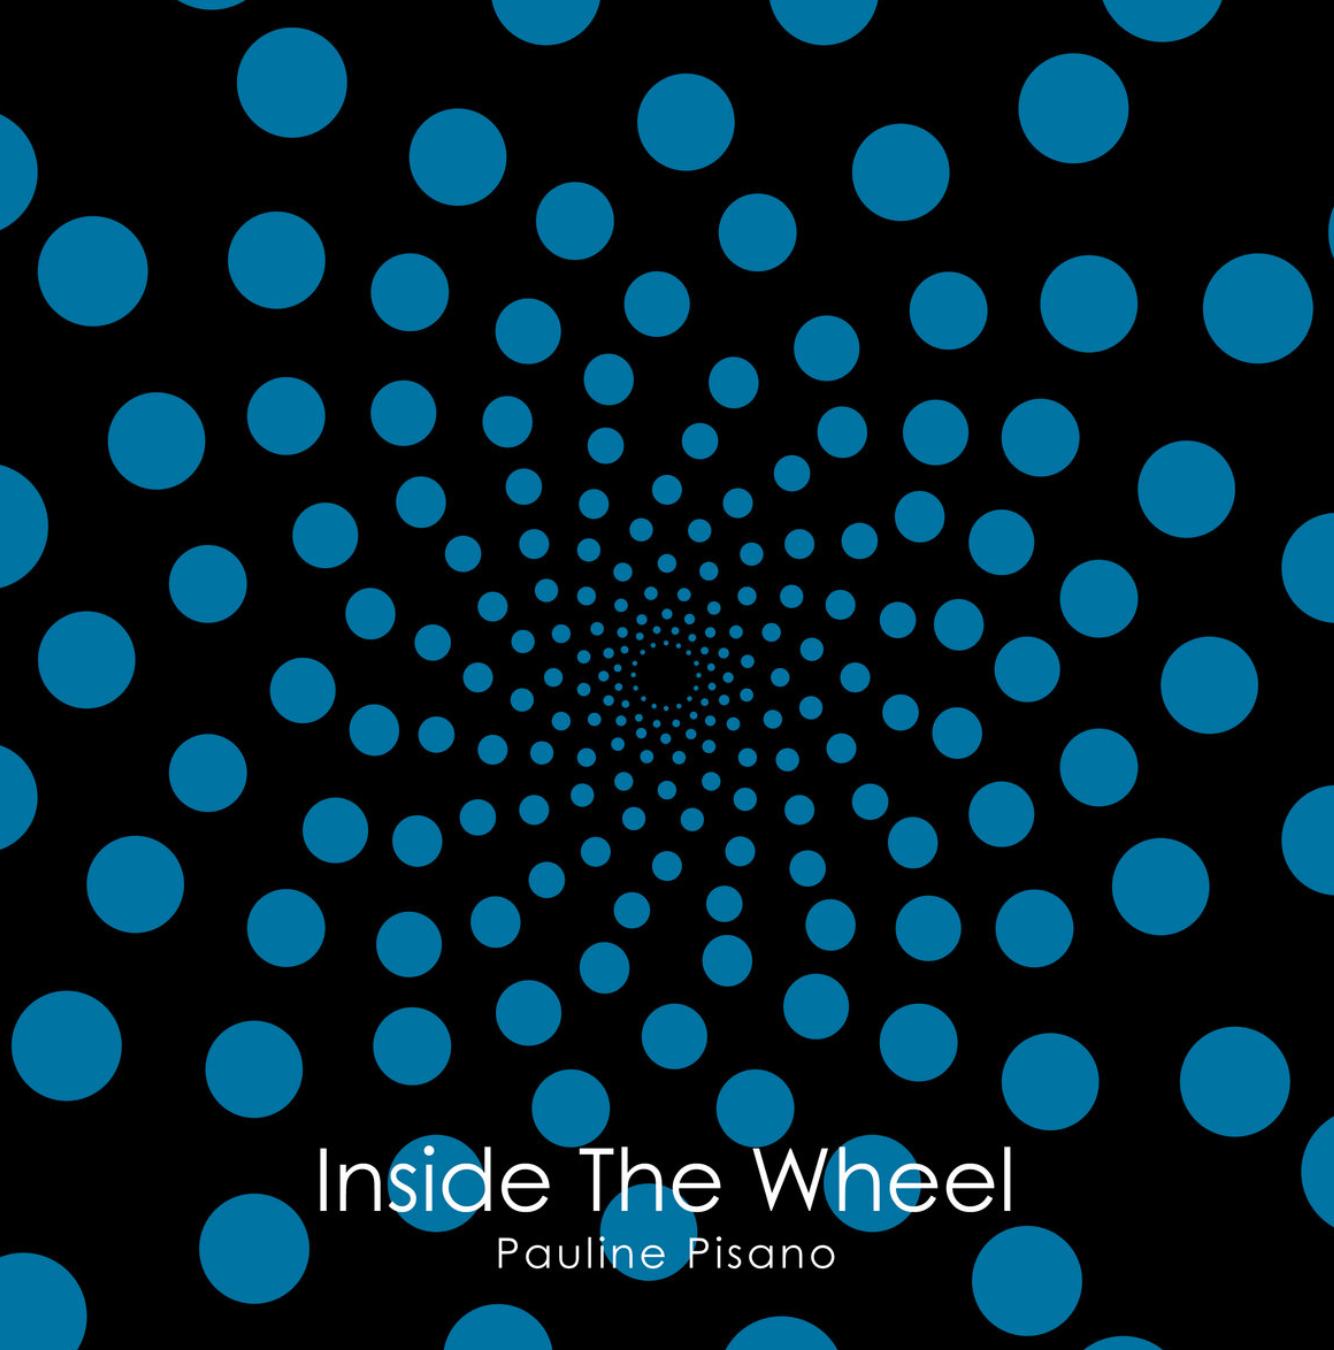 Inside The Wheel